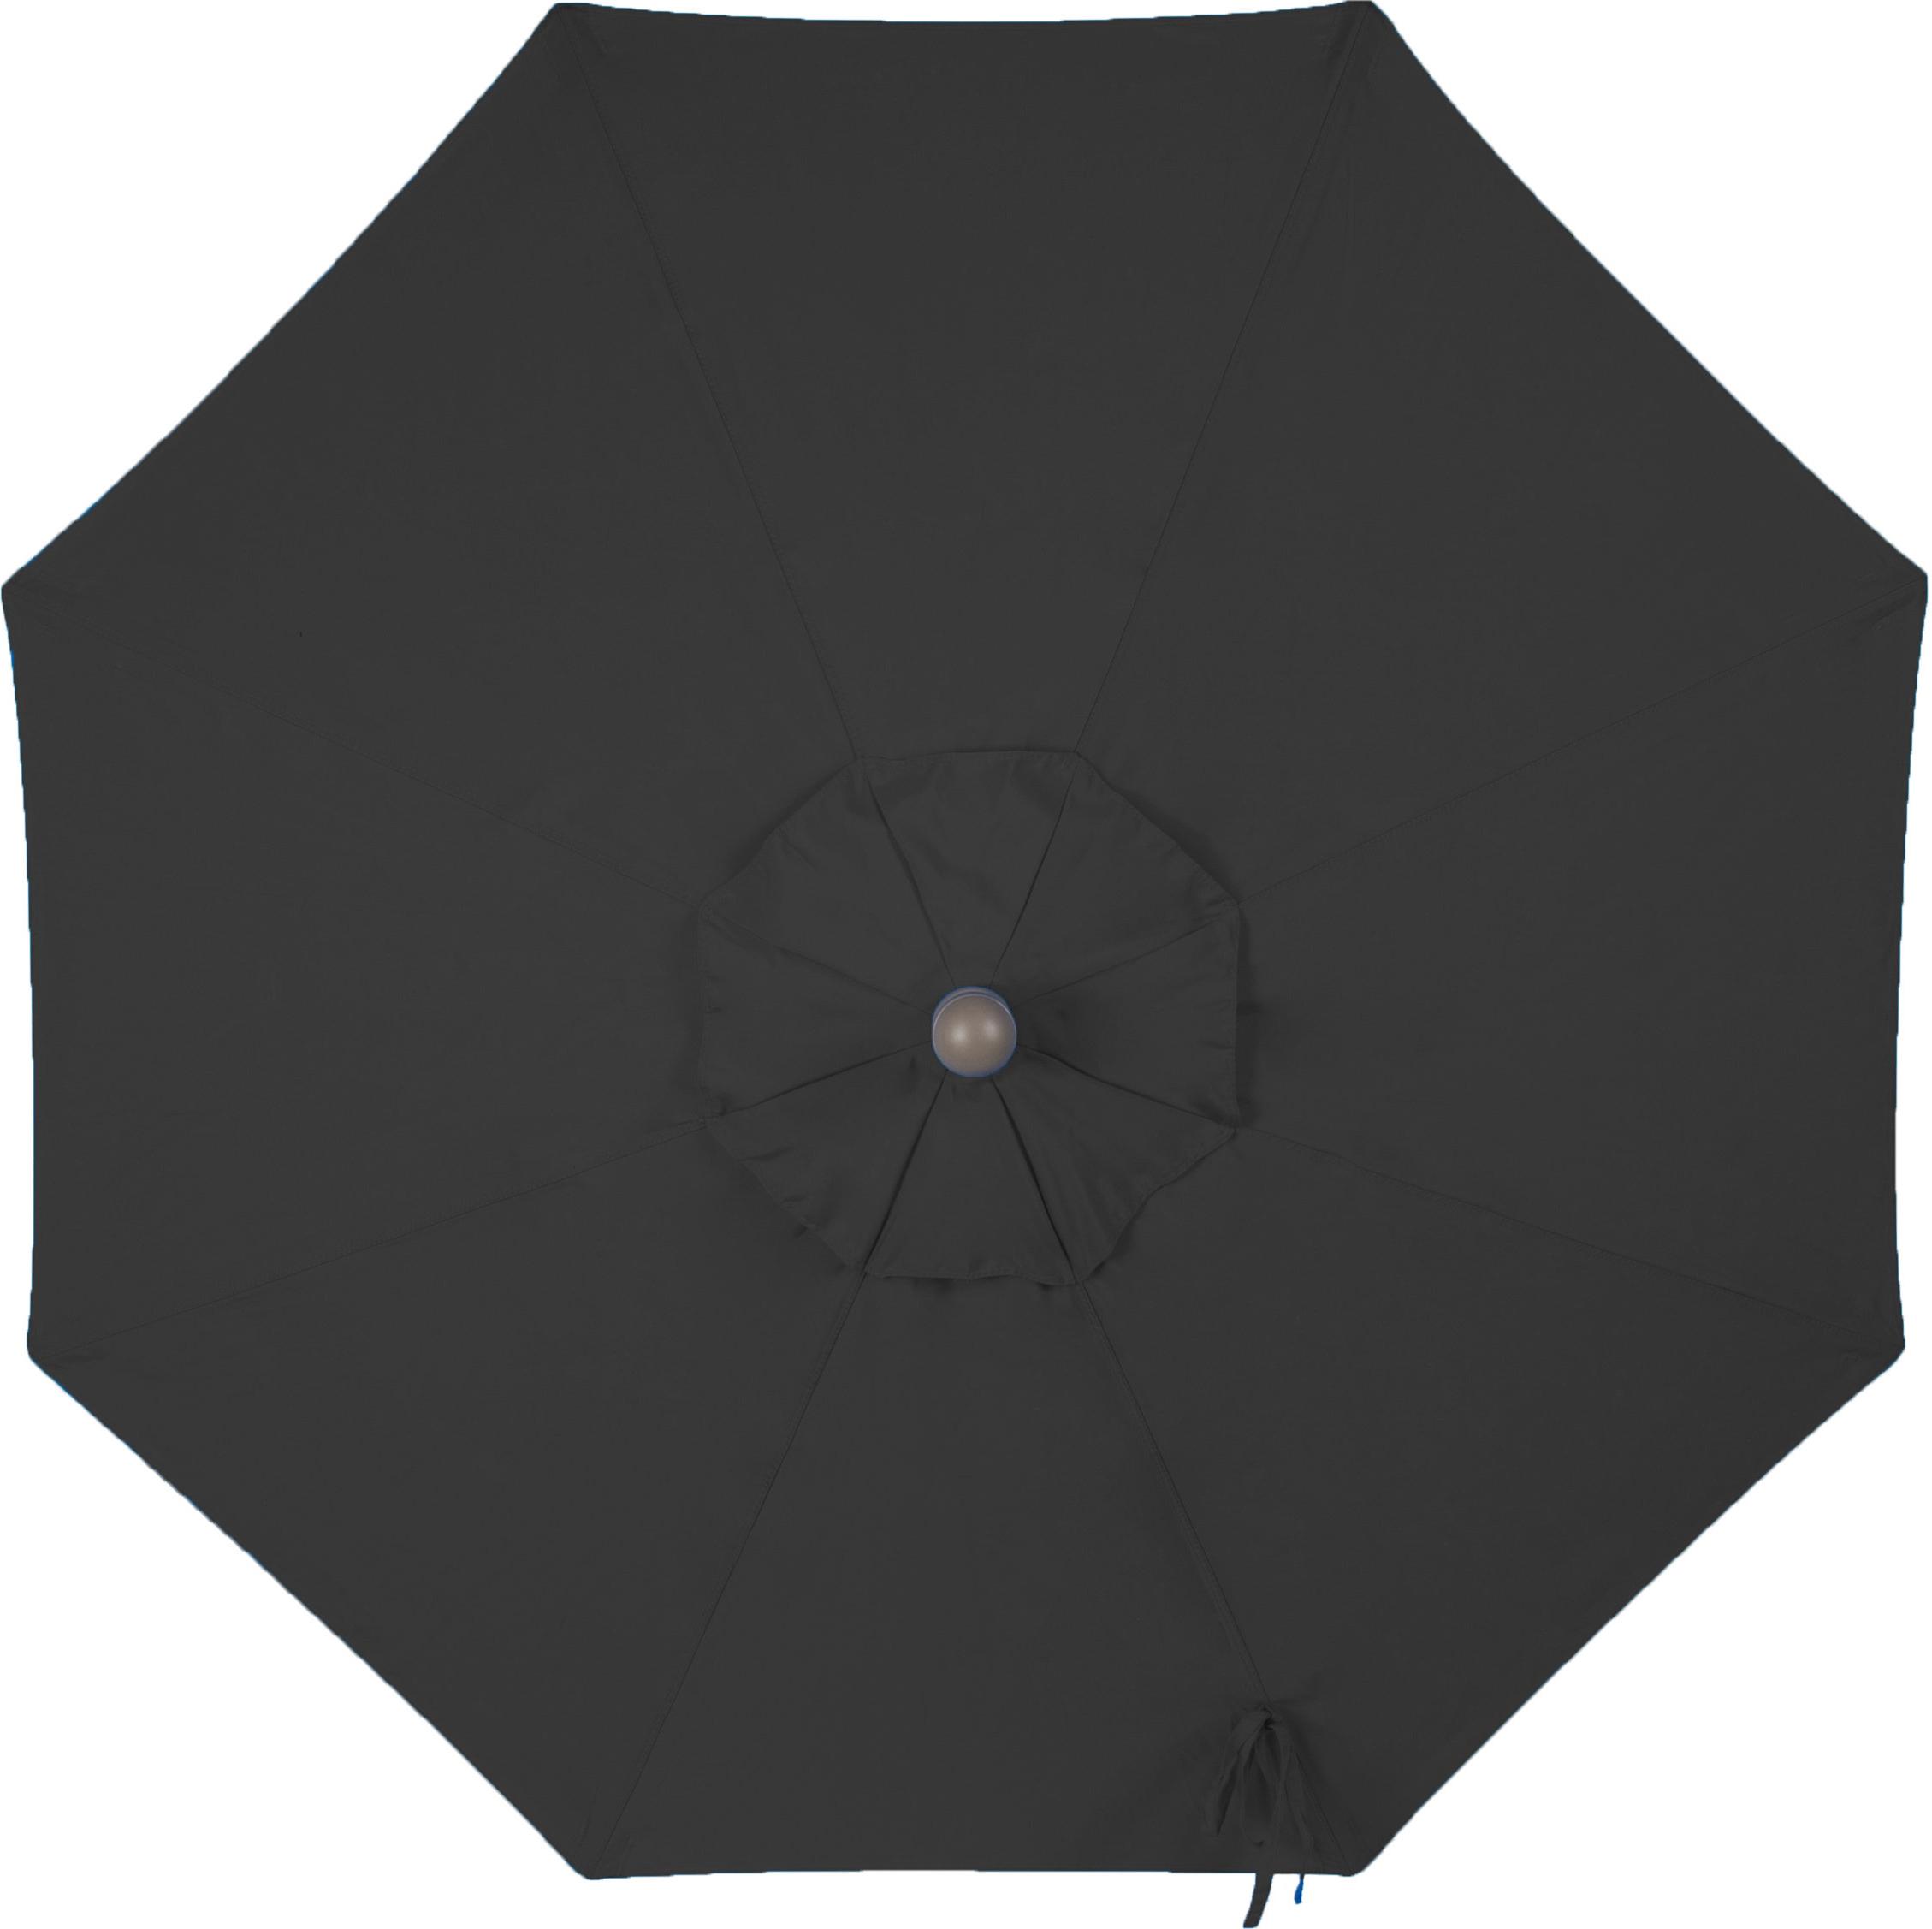 Favorite Wiechmann 9' Market Sunbrella Umbrella Within Wiechmann Market Sunbrella Umbrellas (View 4 of 20)